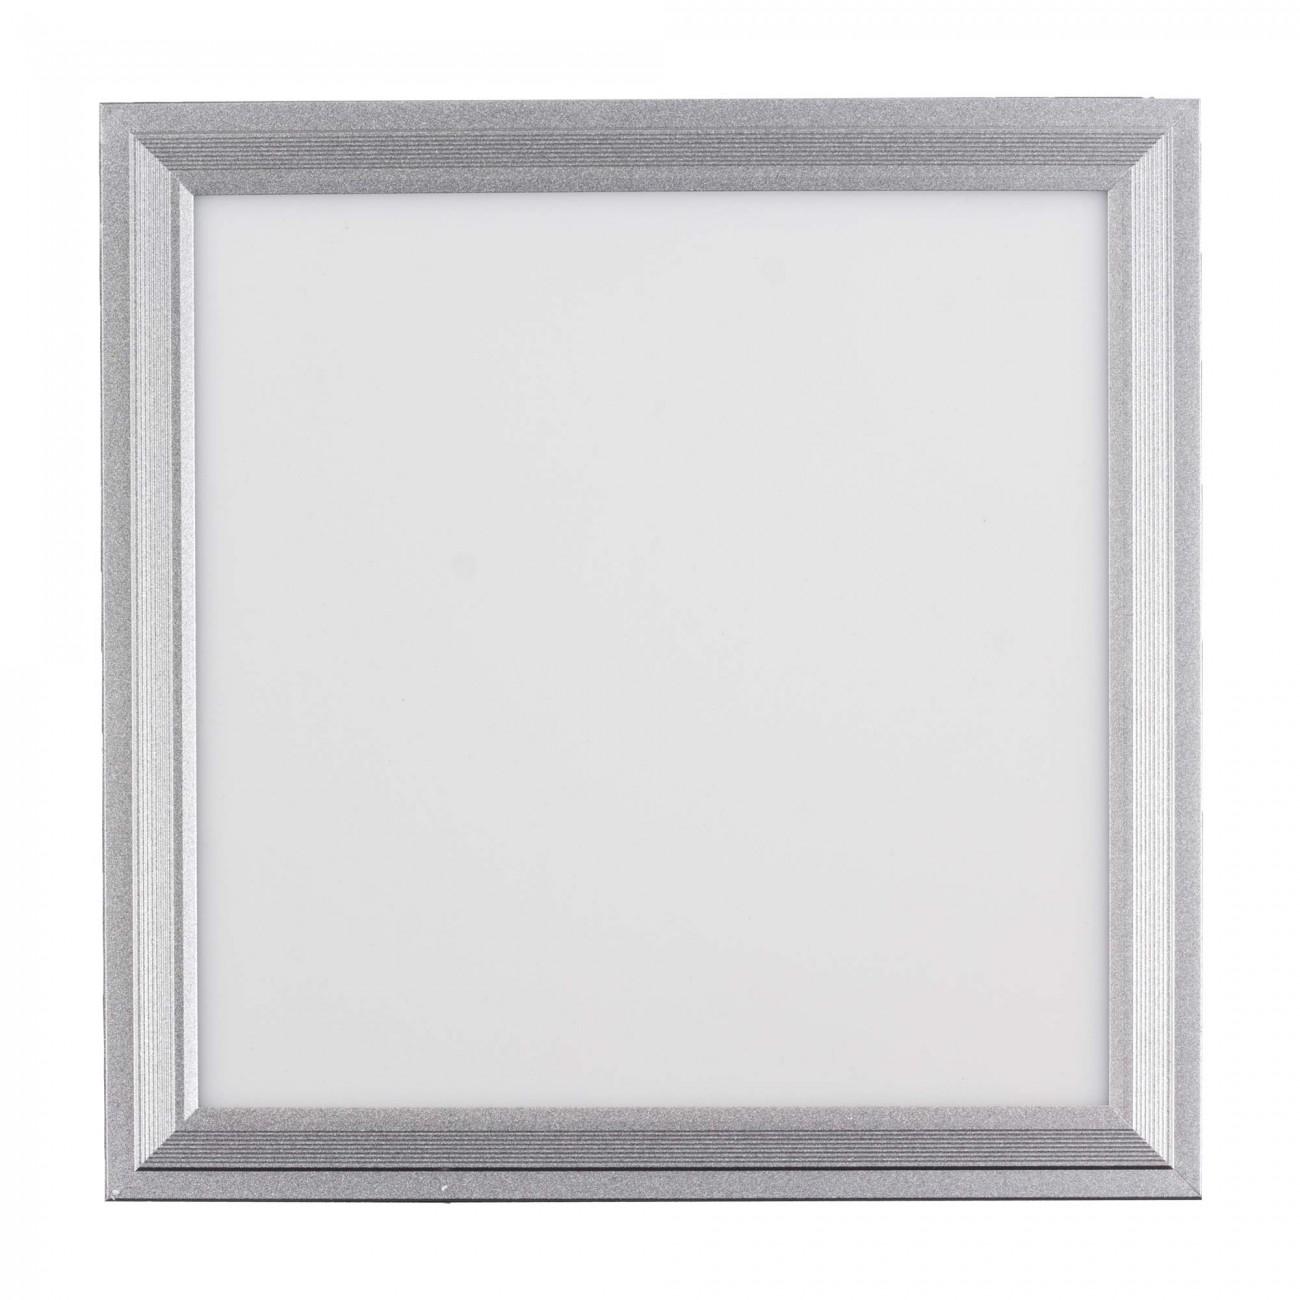 Maxcraft Led Panel Light Slim 12w 300 X 300 X 15 Mm Warm White